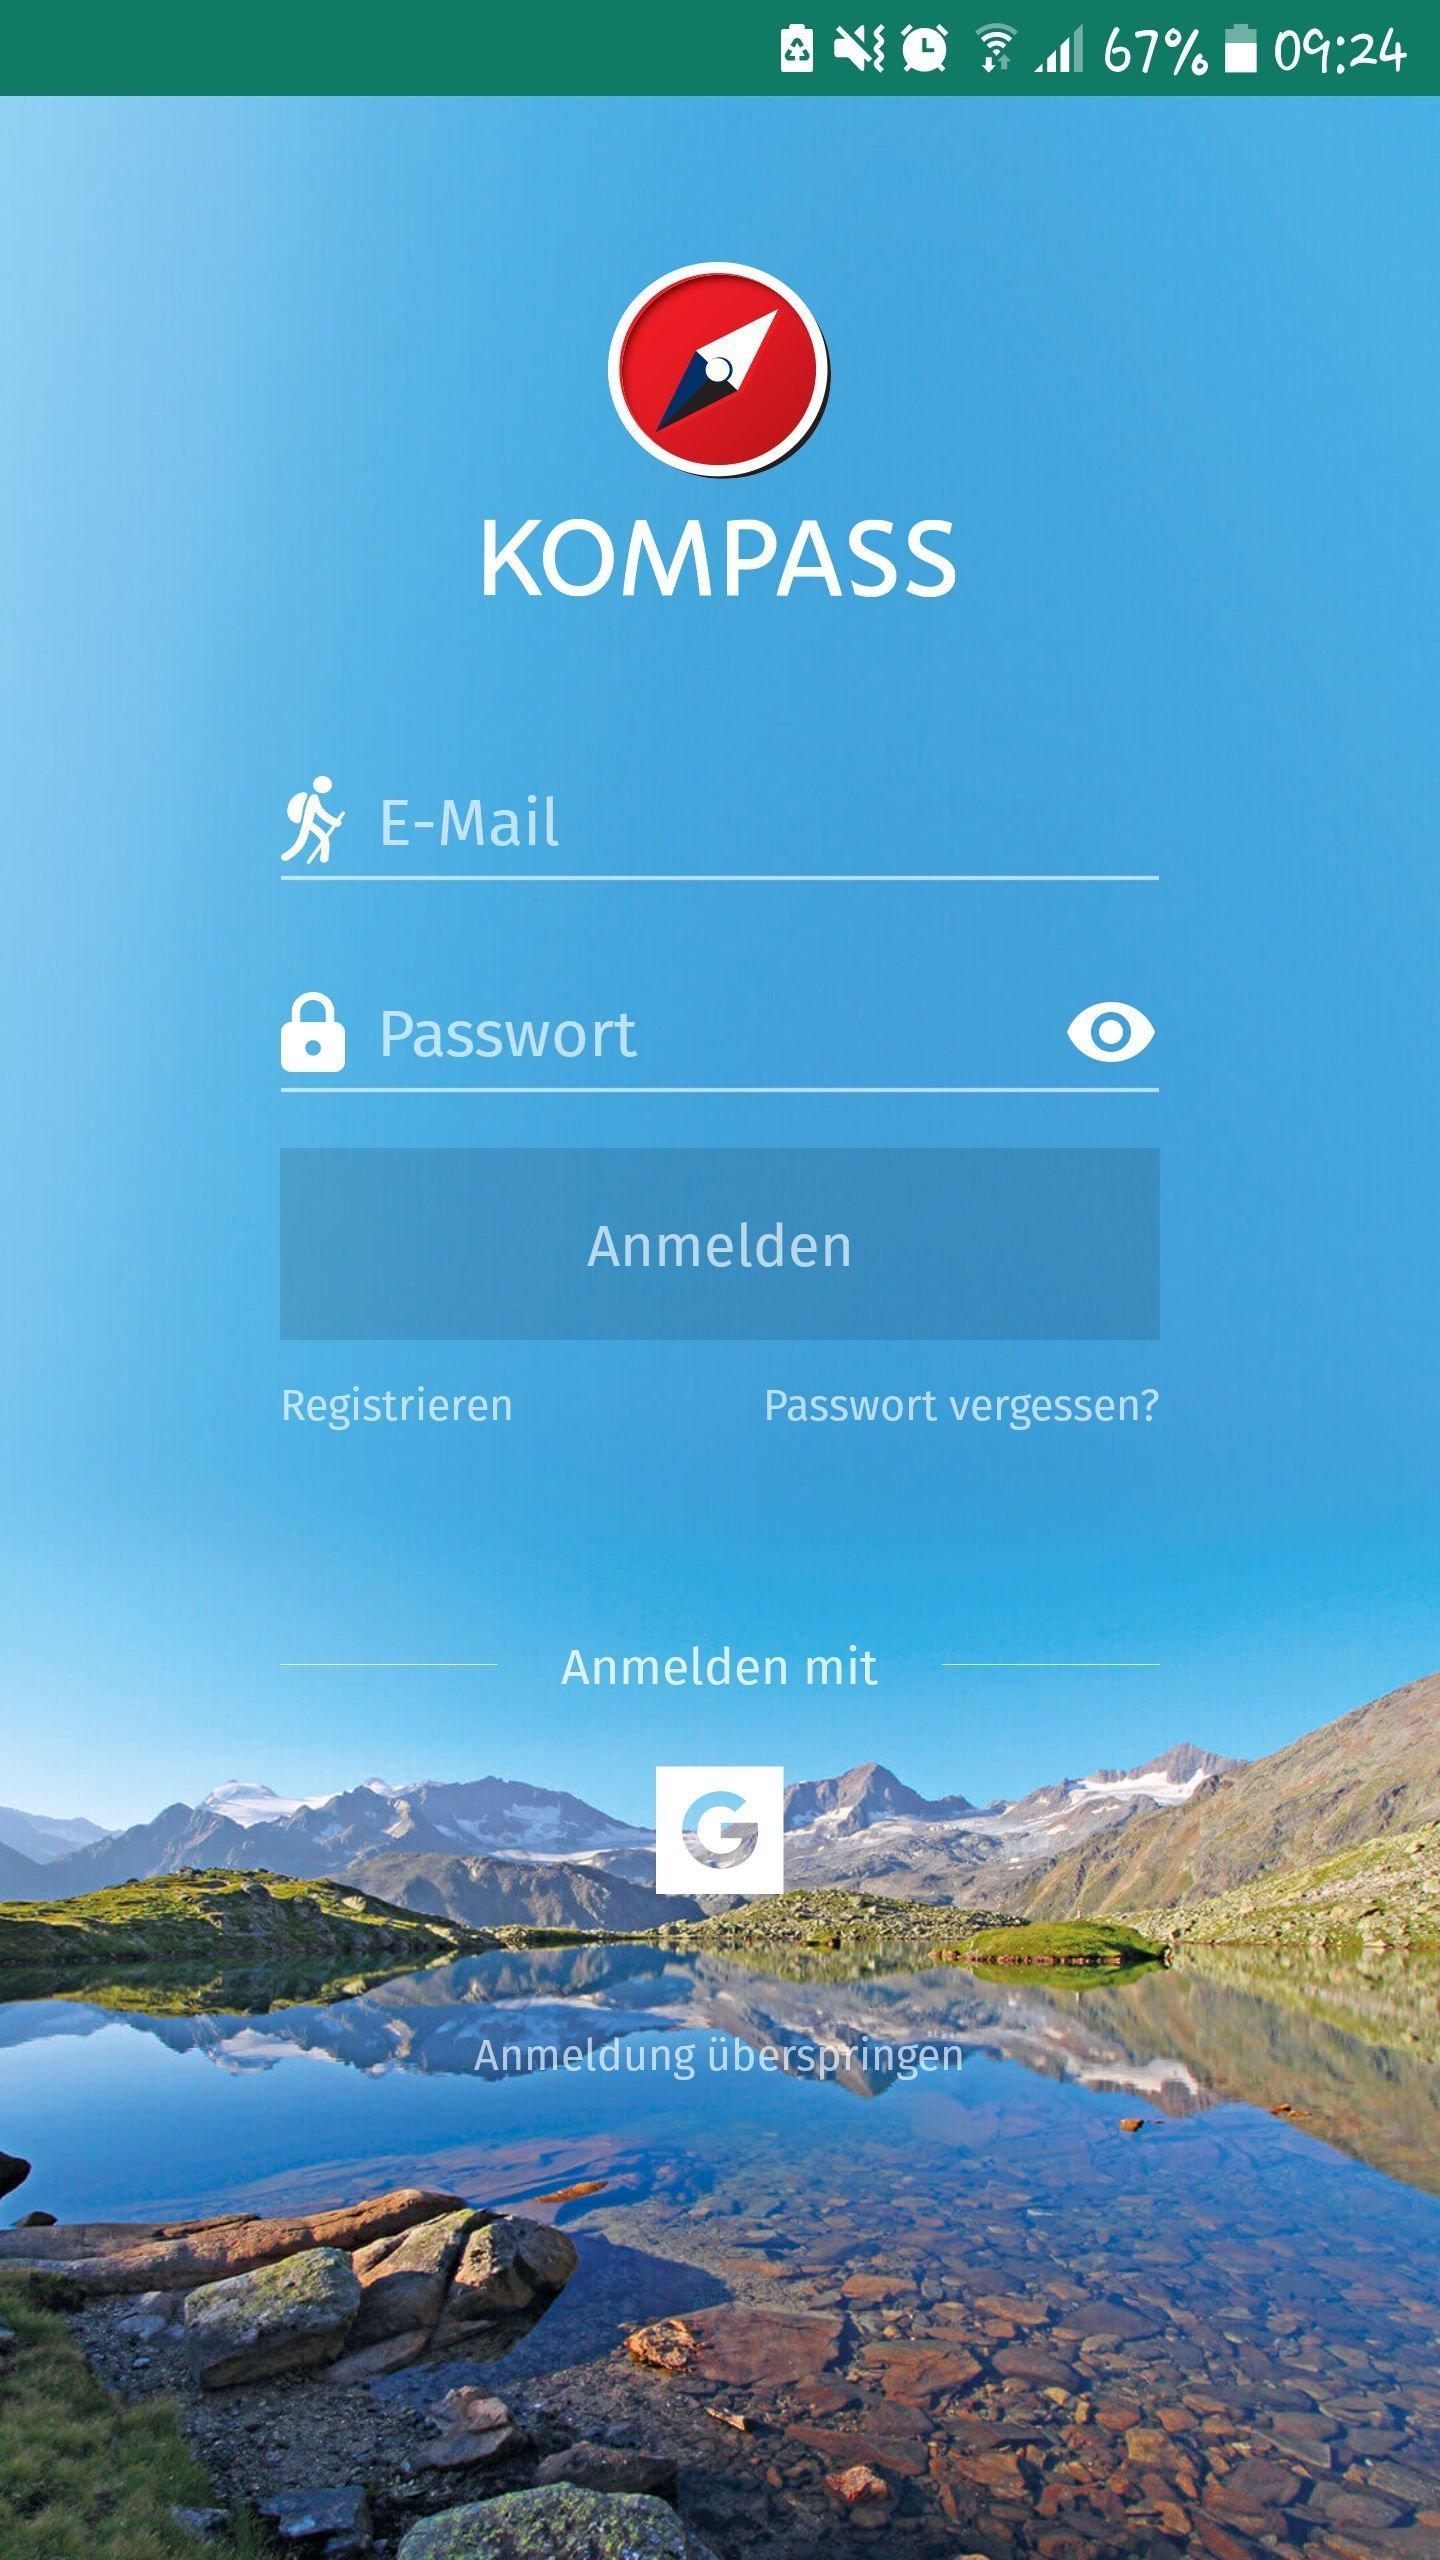 Kompass App - Startbildschirm